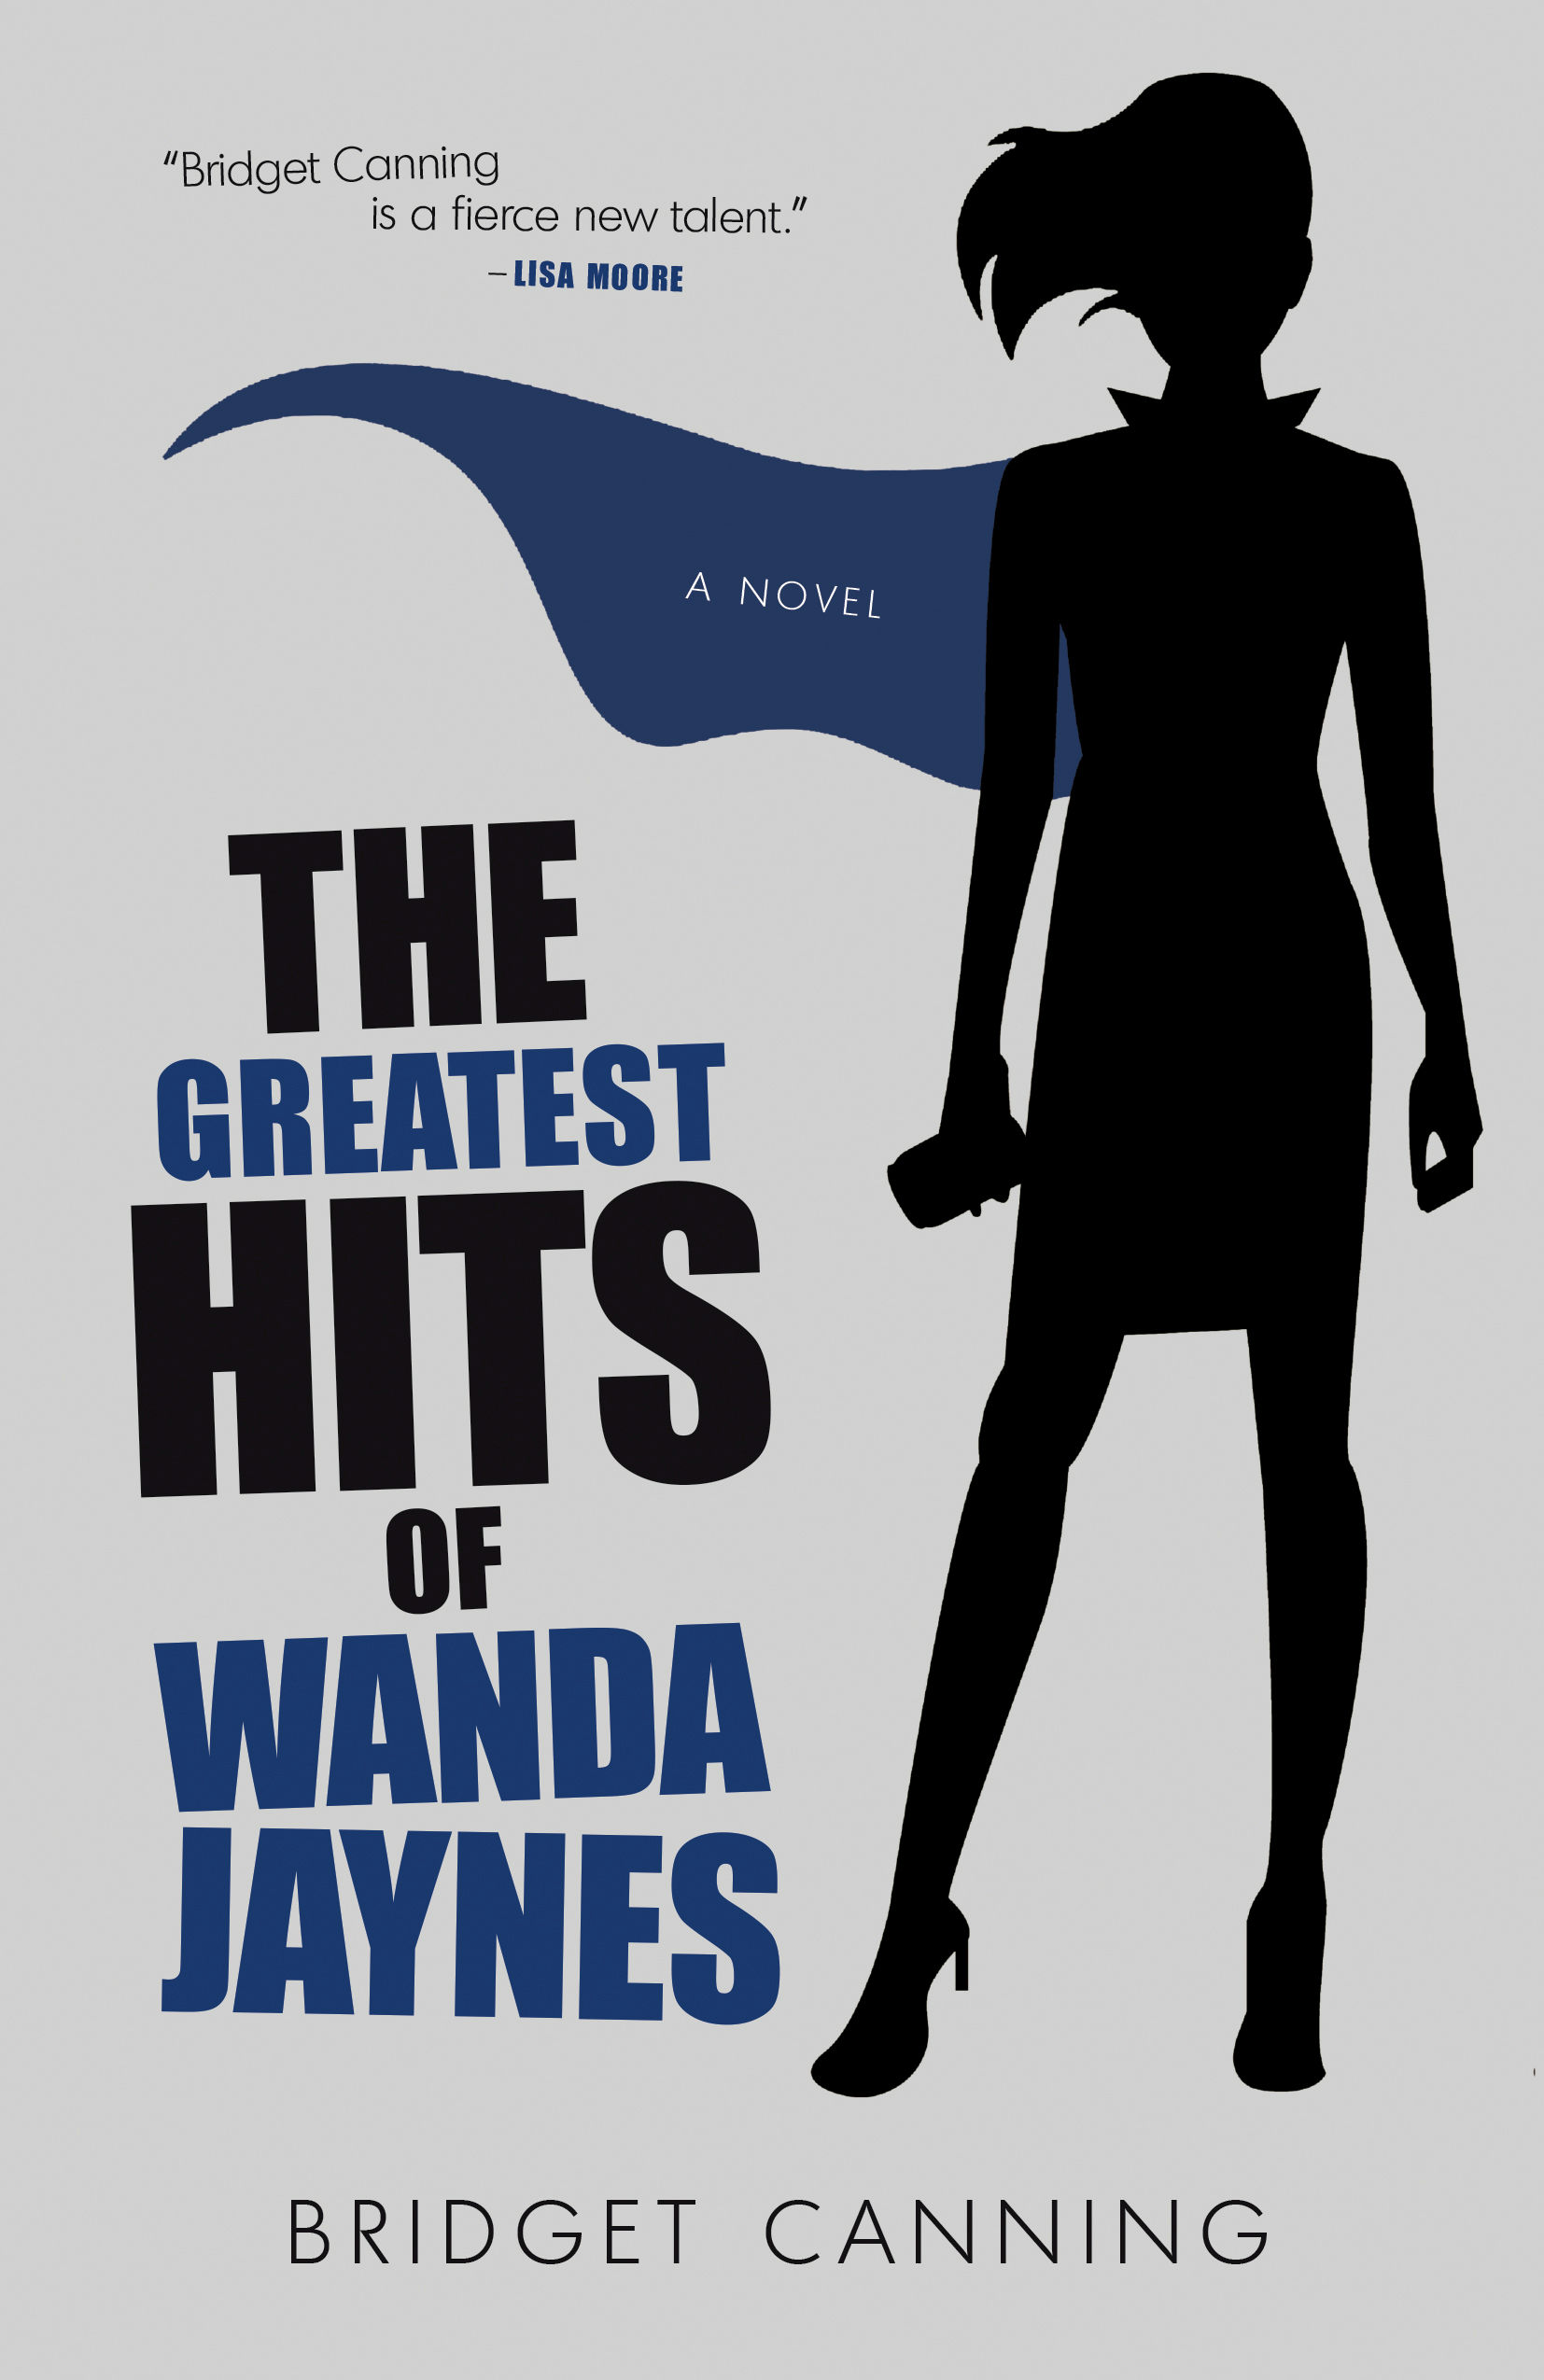 The Greatest Hits of Wanda Jaynes